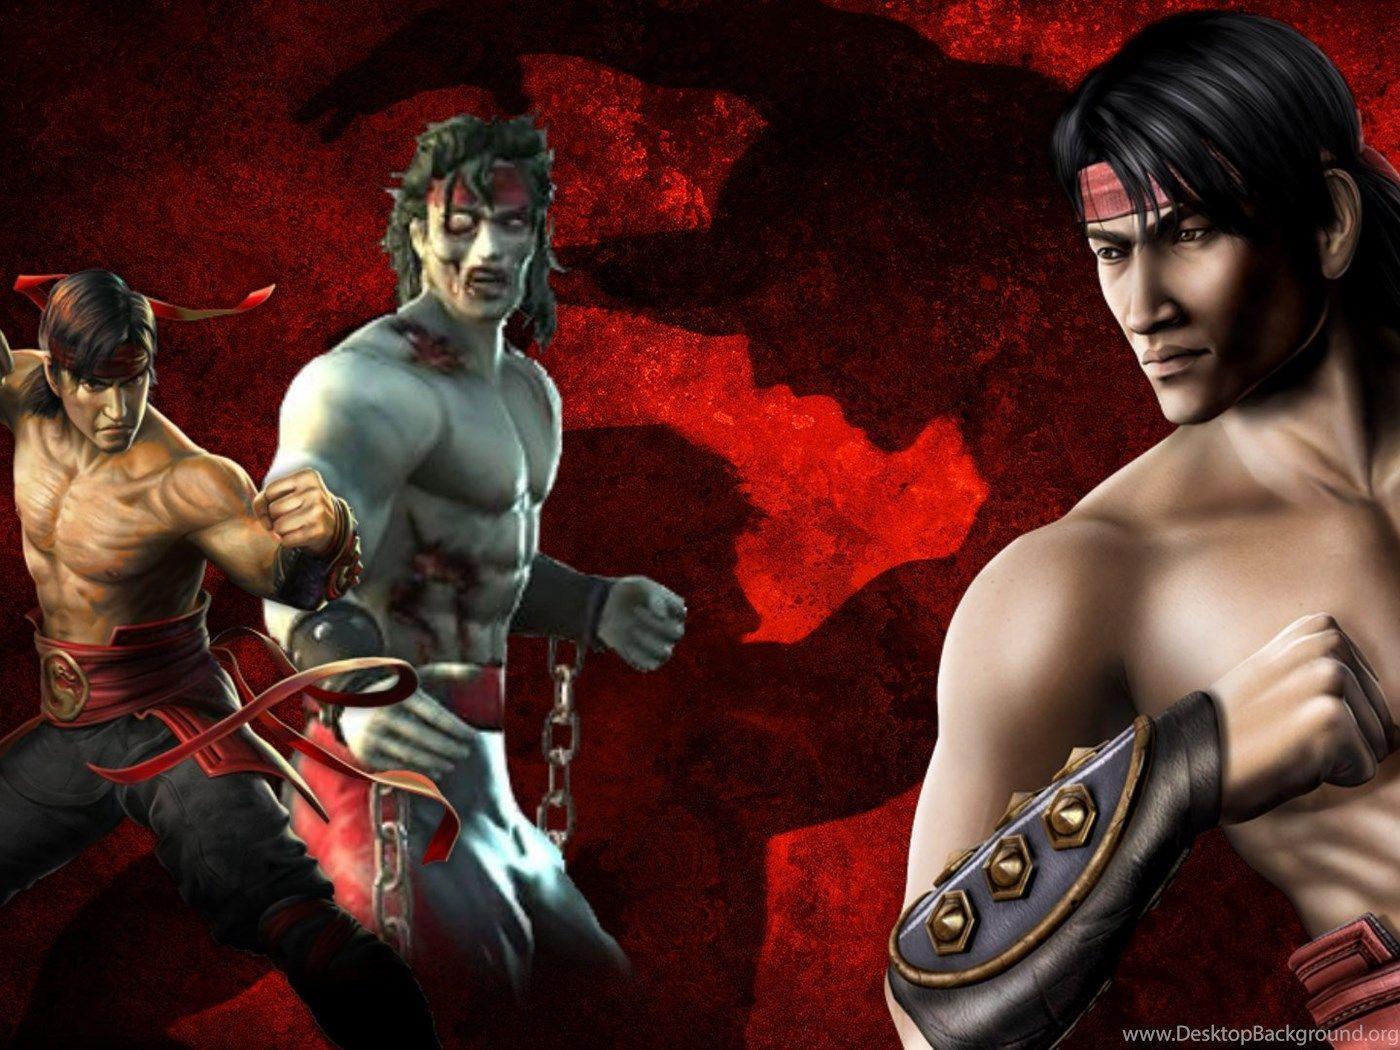 Mortal Kombat Liu Kang Wallpapers Top Free Mortal Kombat Liu Kang Backgrounds Wallpaperaccess